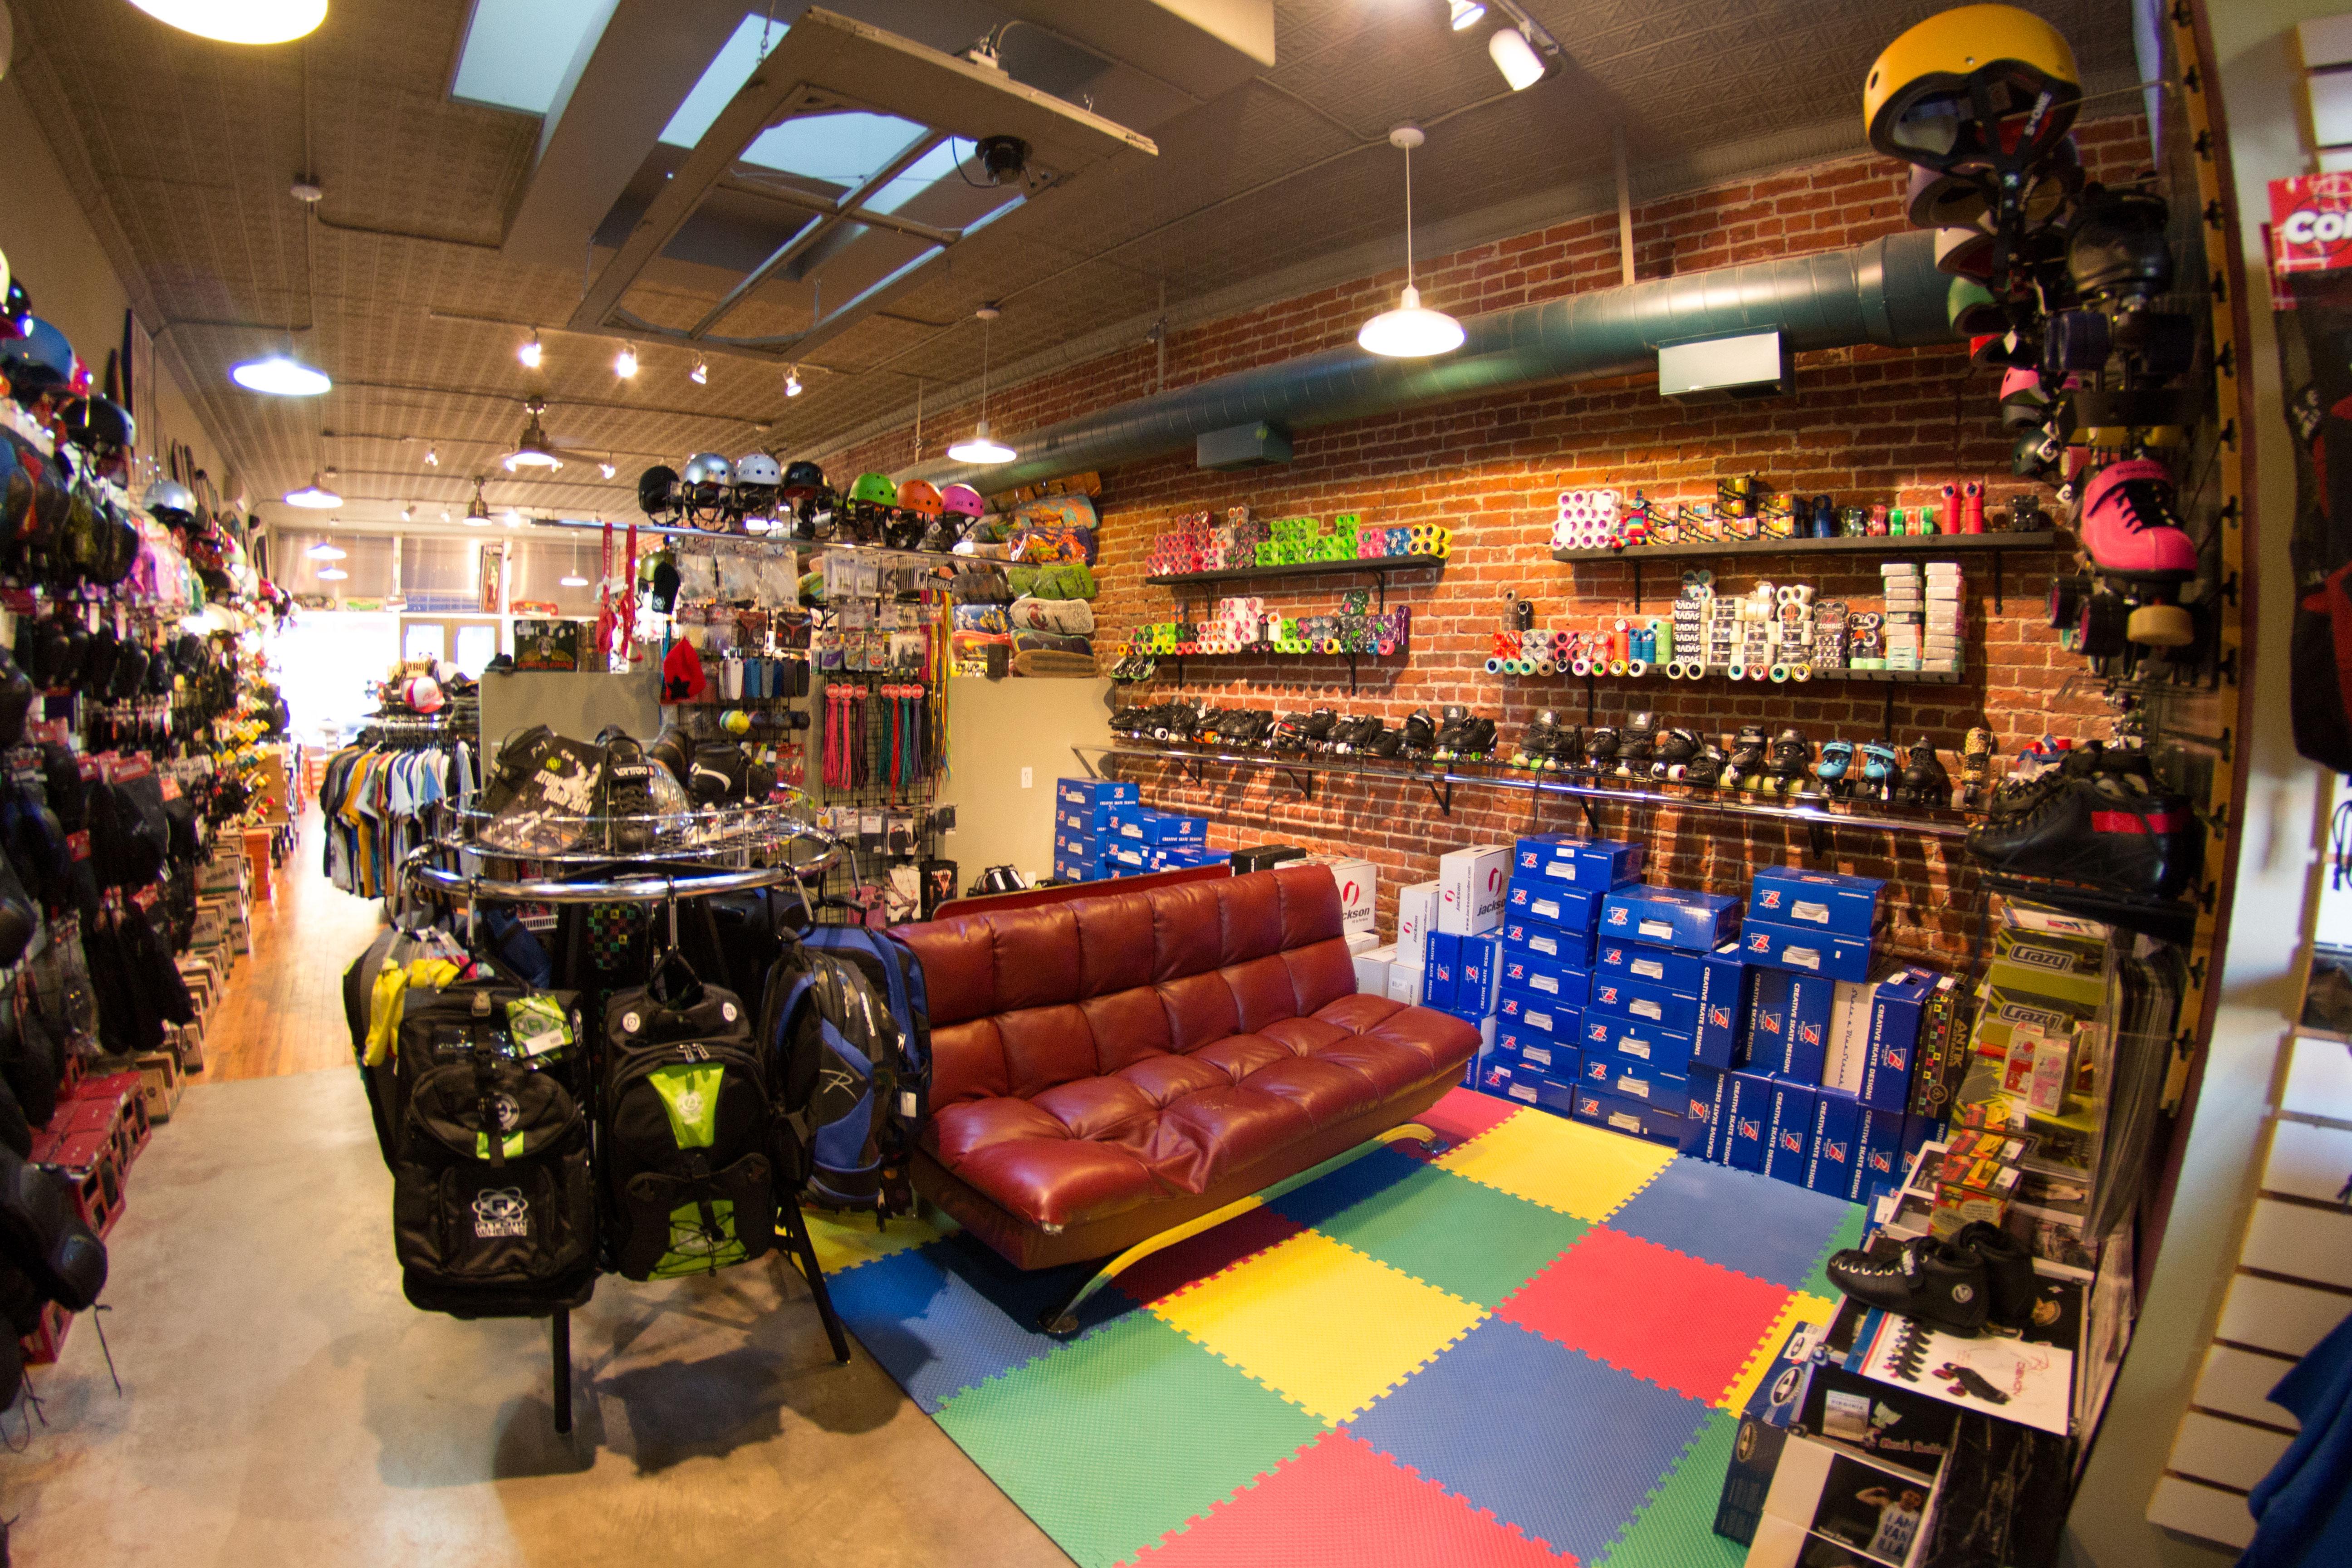 check out 2952d f7f3a Skate Ratz - skate shop Photo Tour 343 e. 4th st Loveland ...